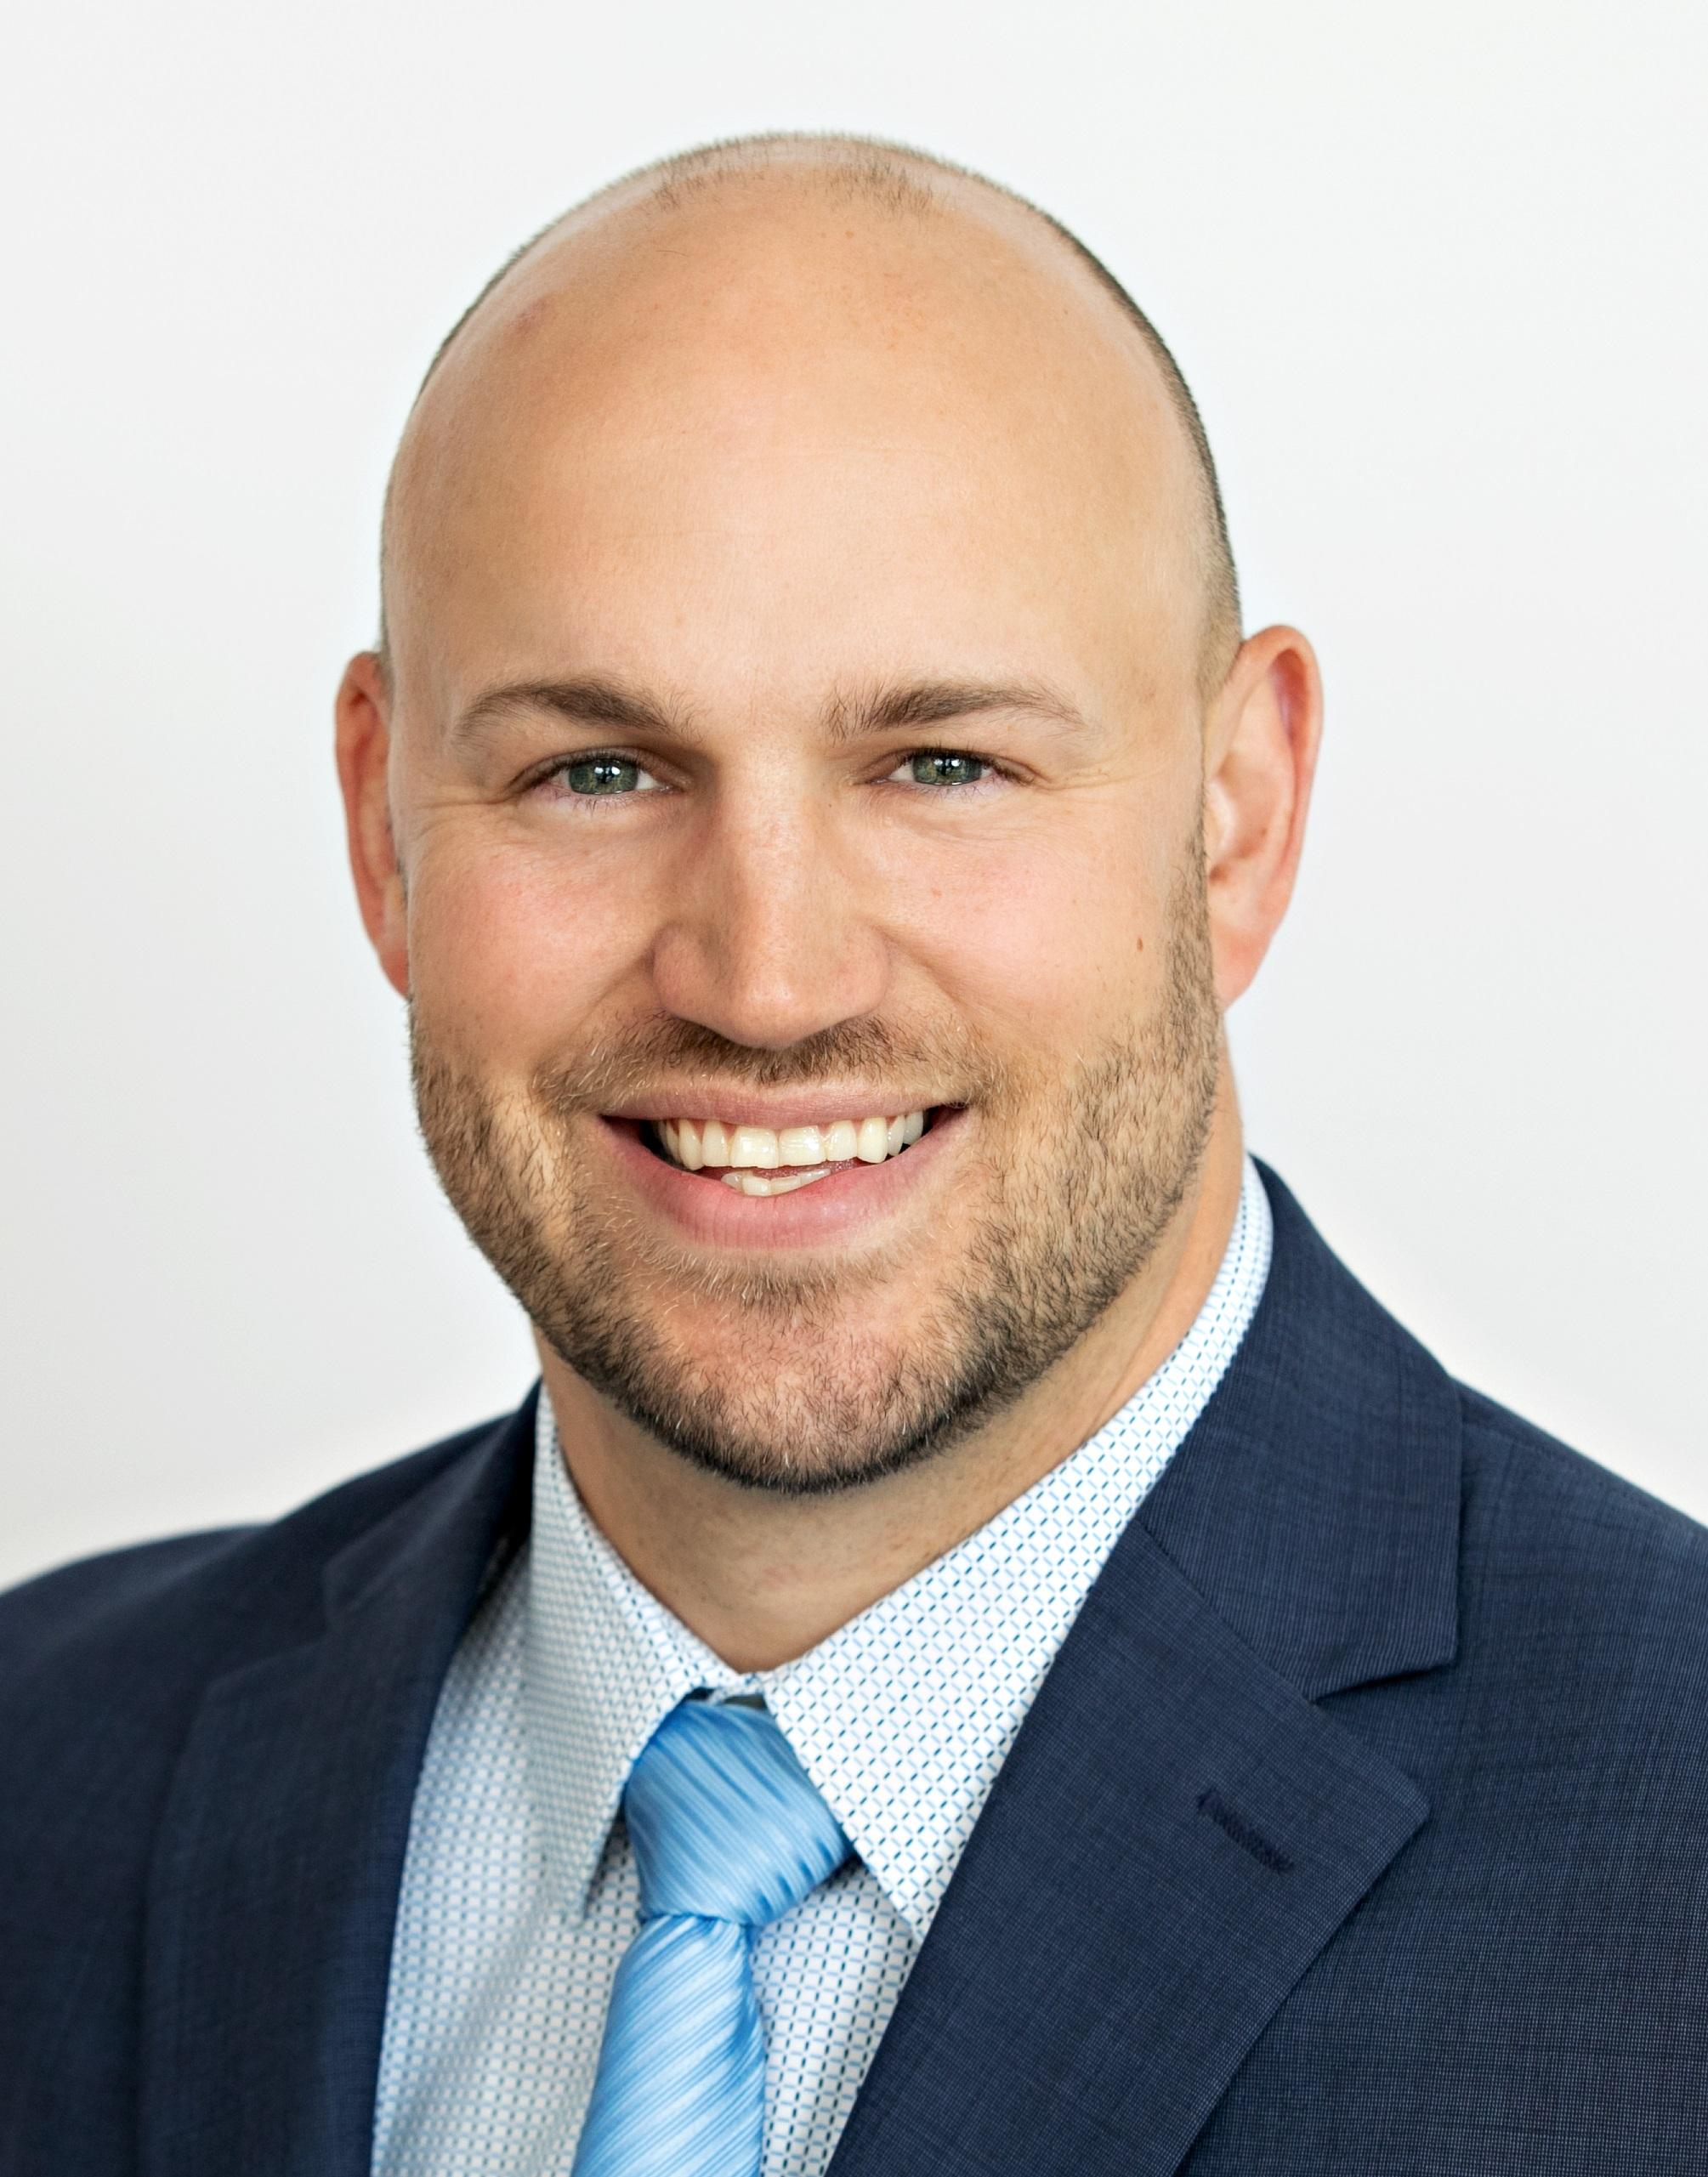 Brandon Beckstrom